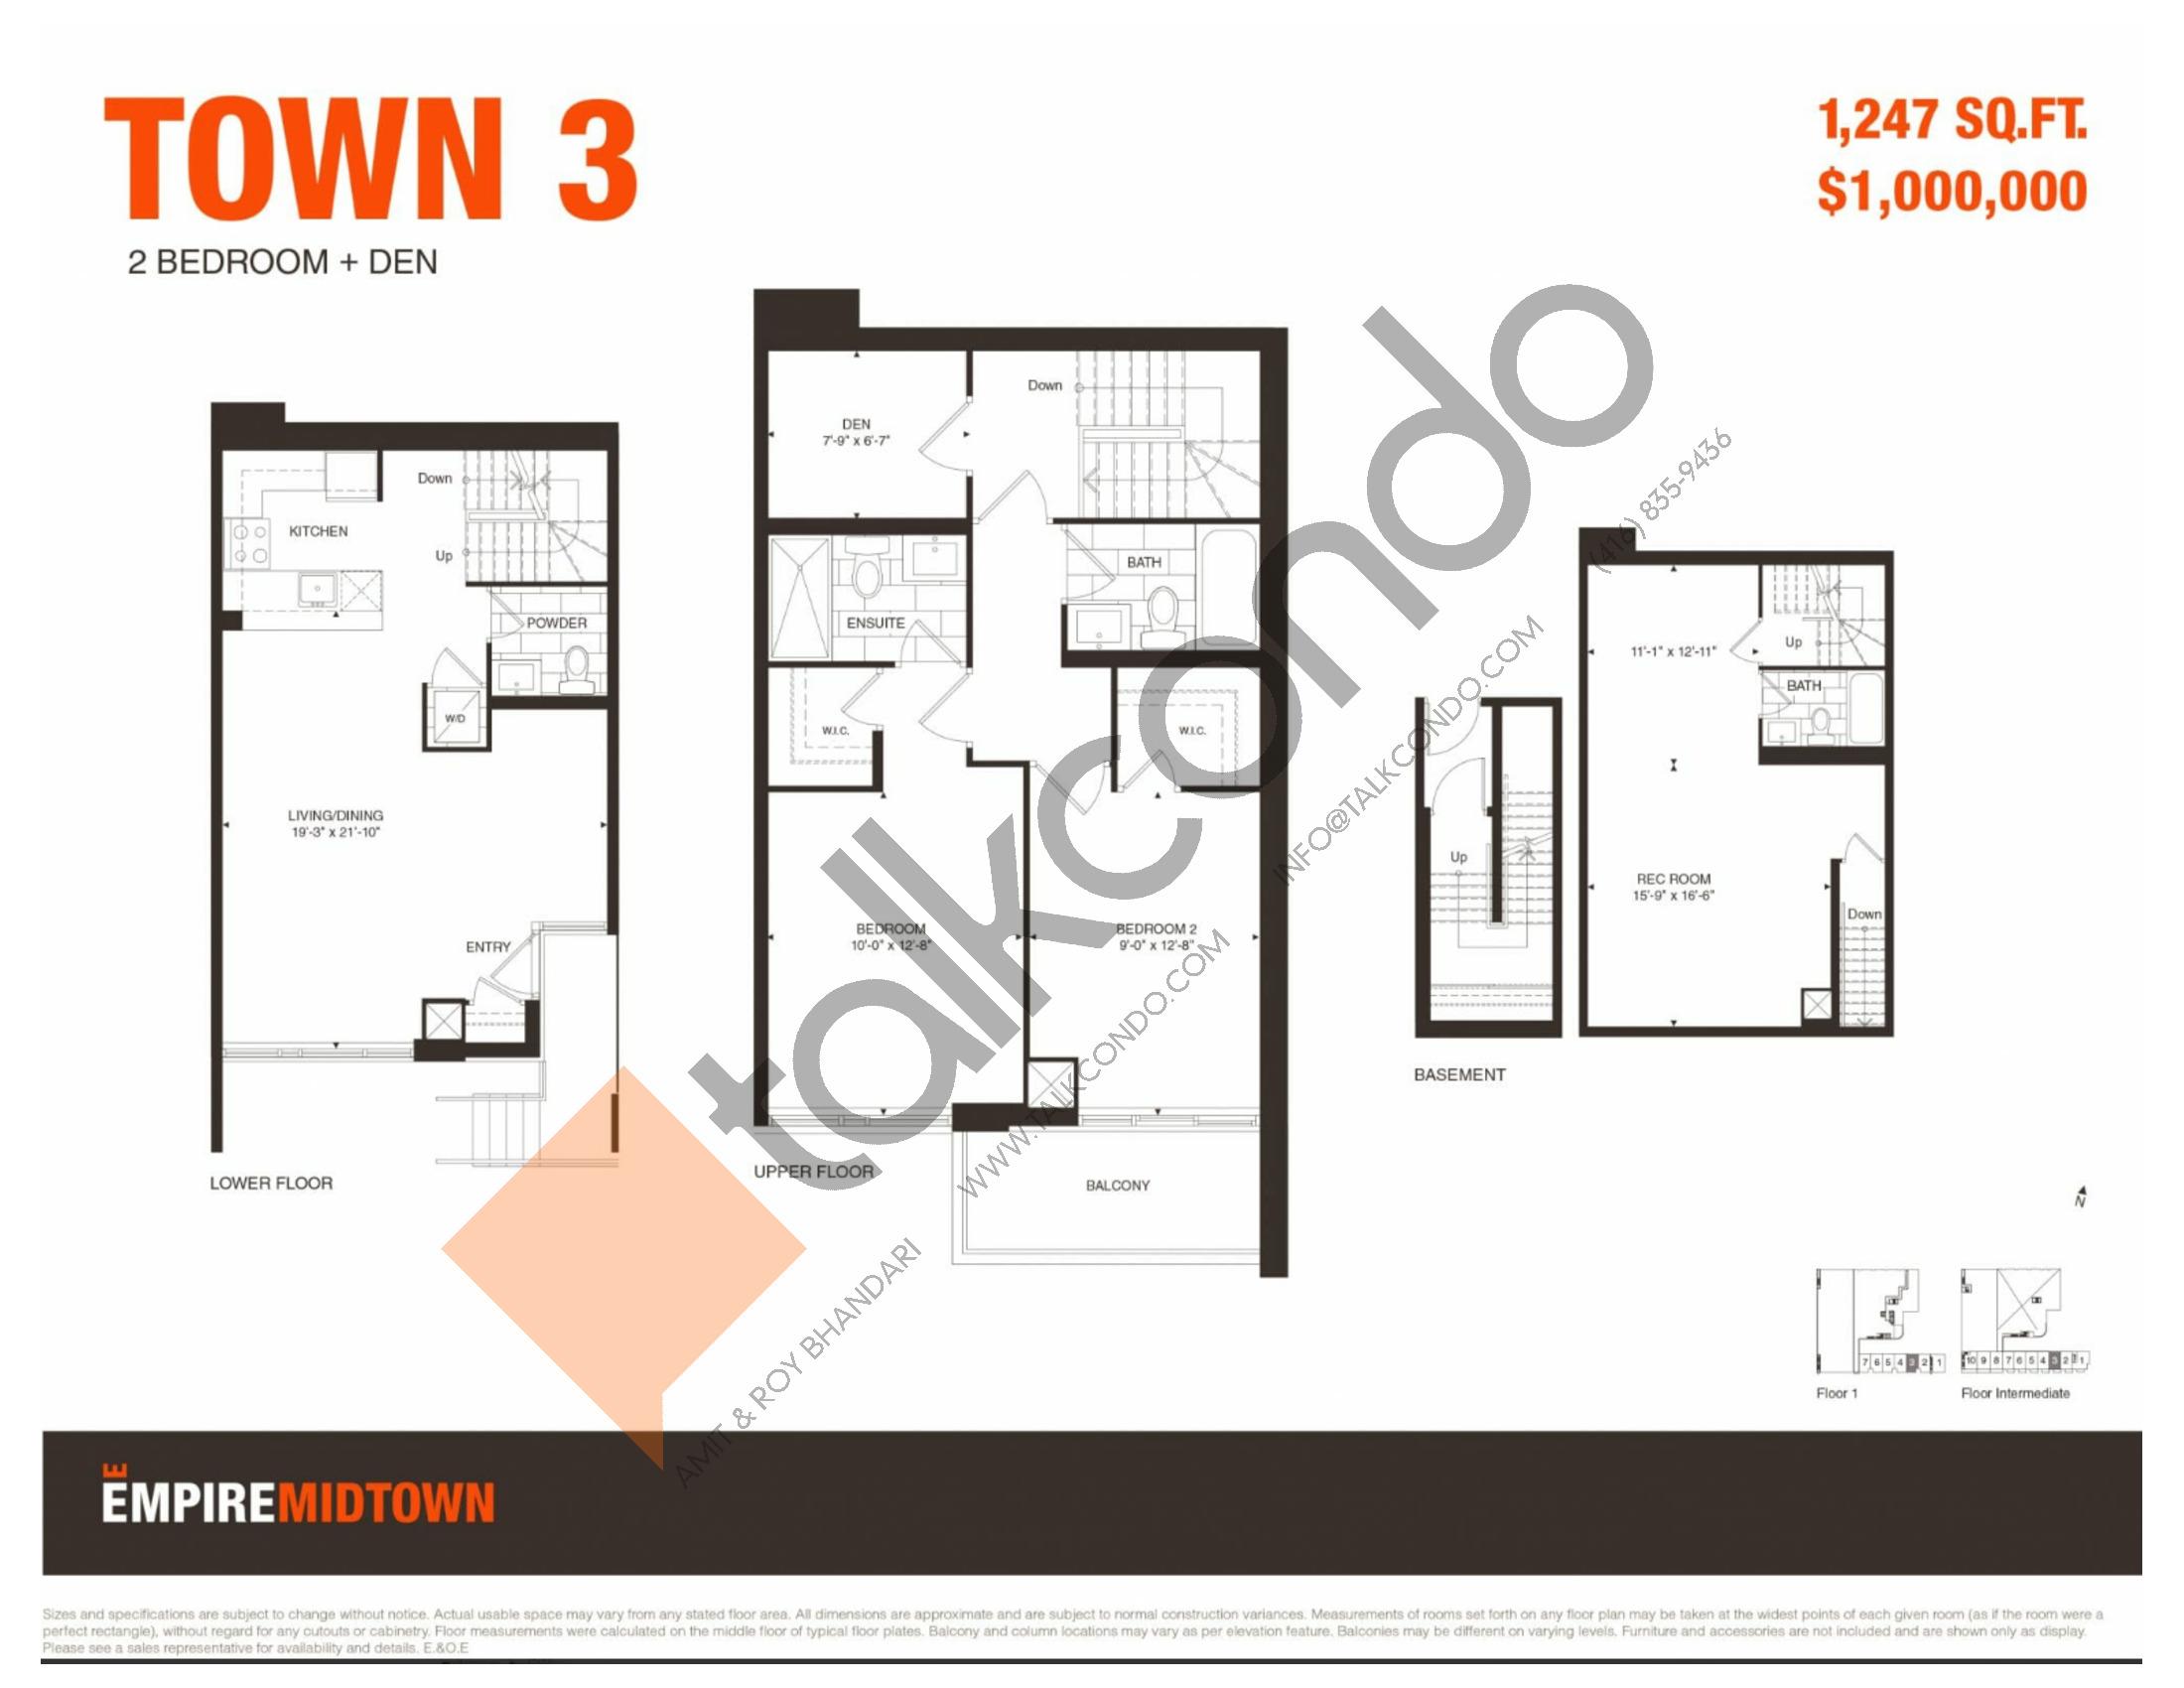 Town 3 Floor Plan at Empire Midtown Condos - 1247 sq.ft